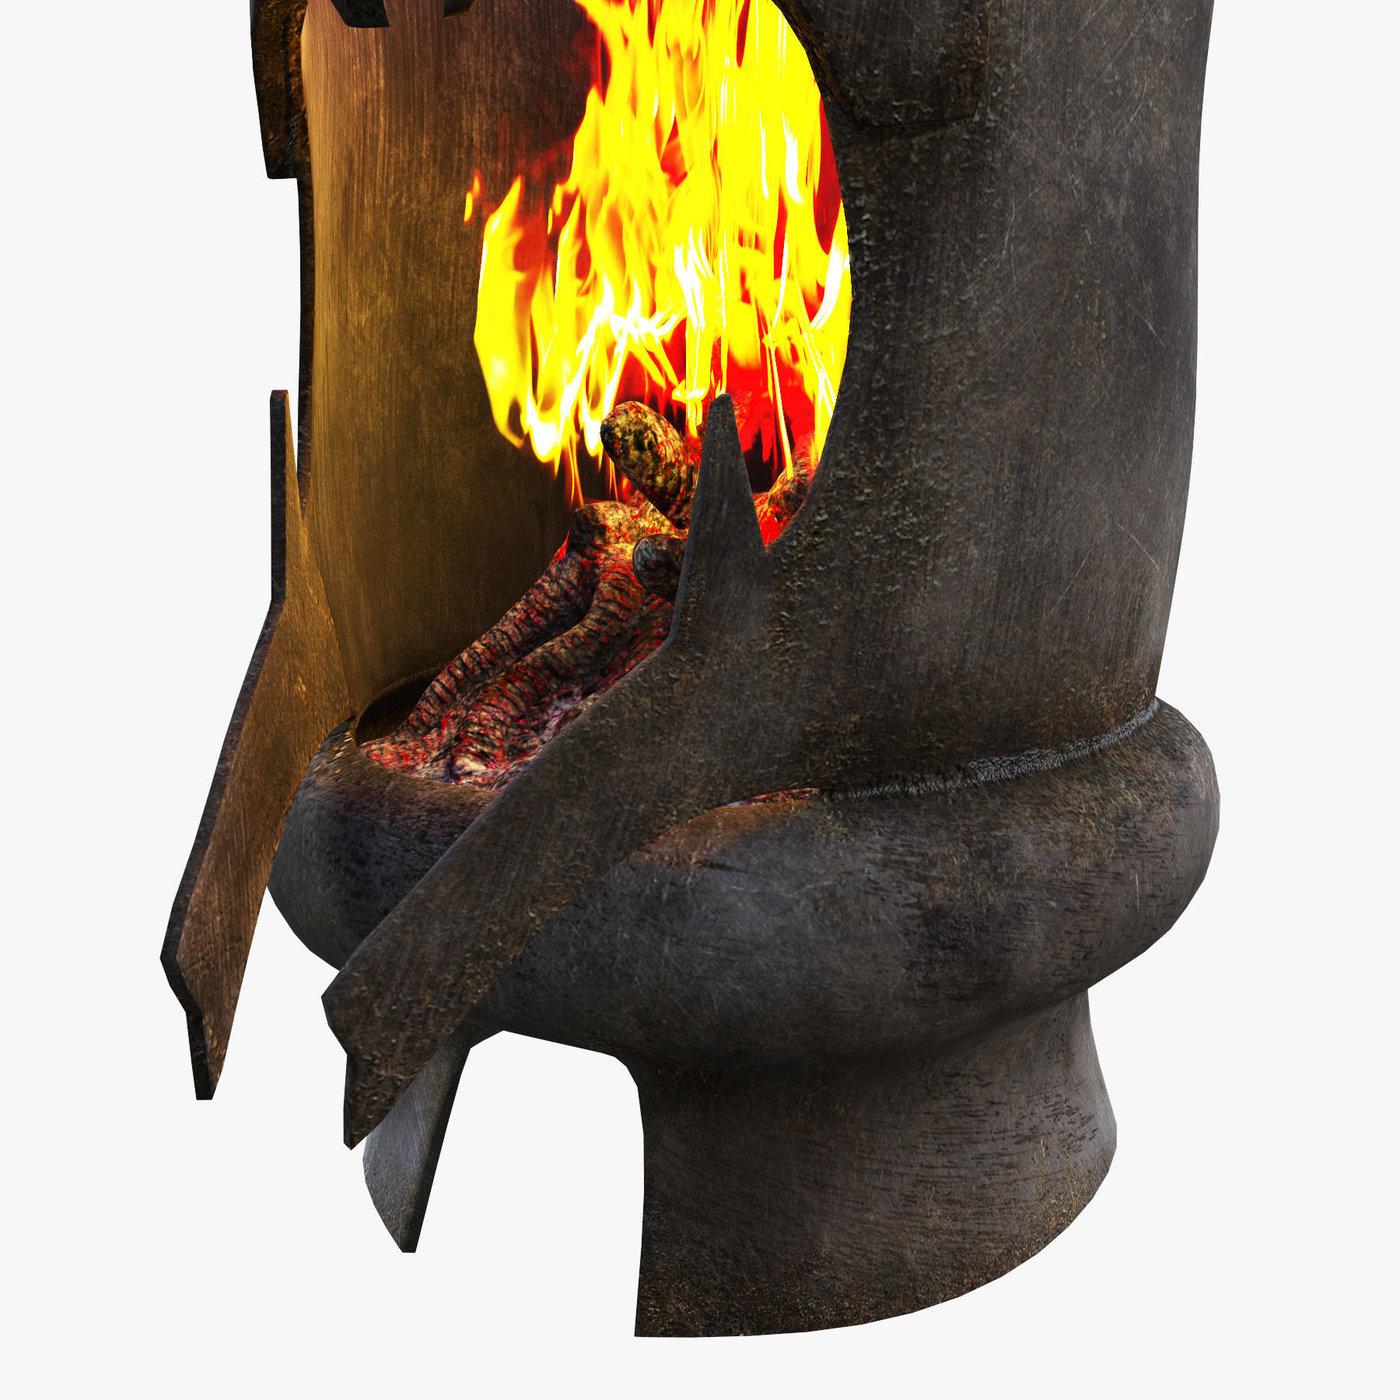 Dark knight head fireplace concept